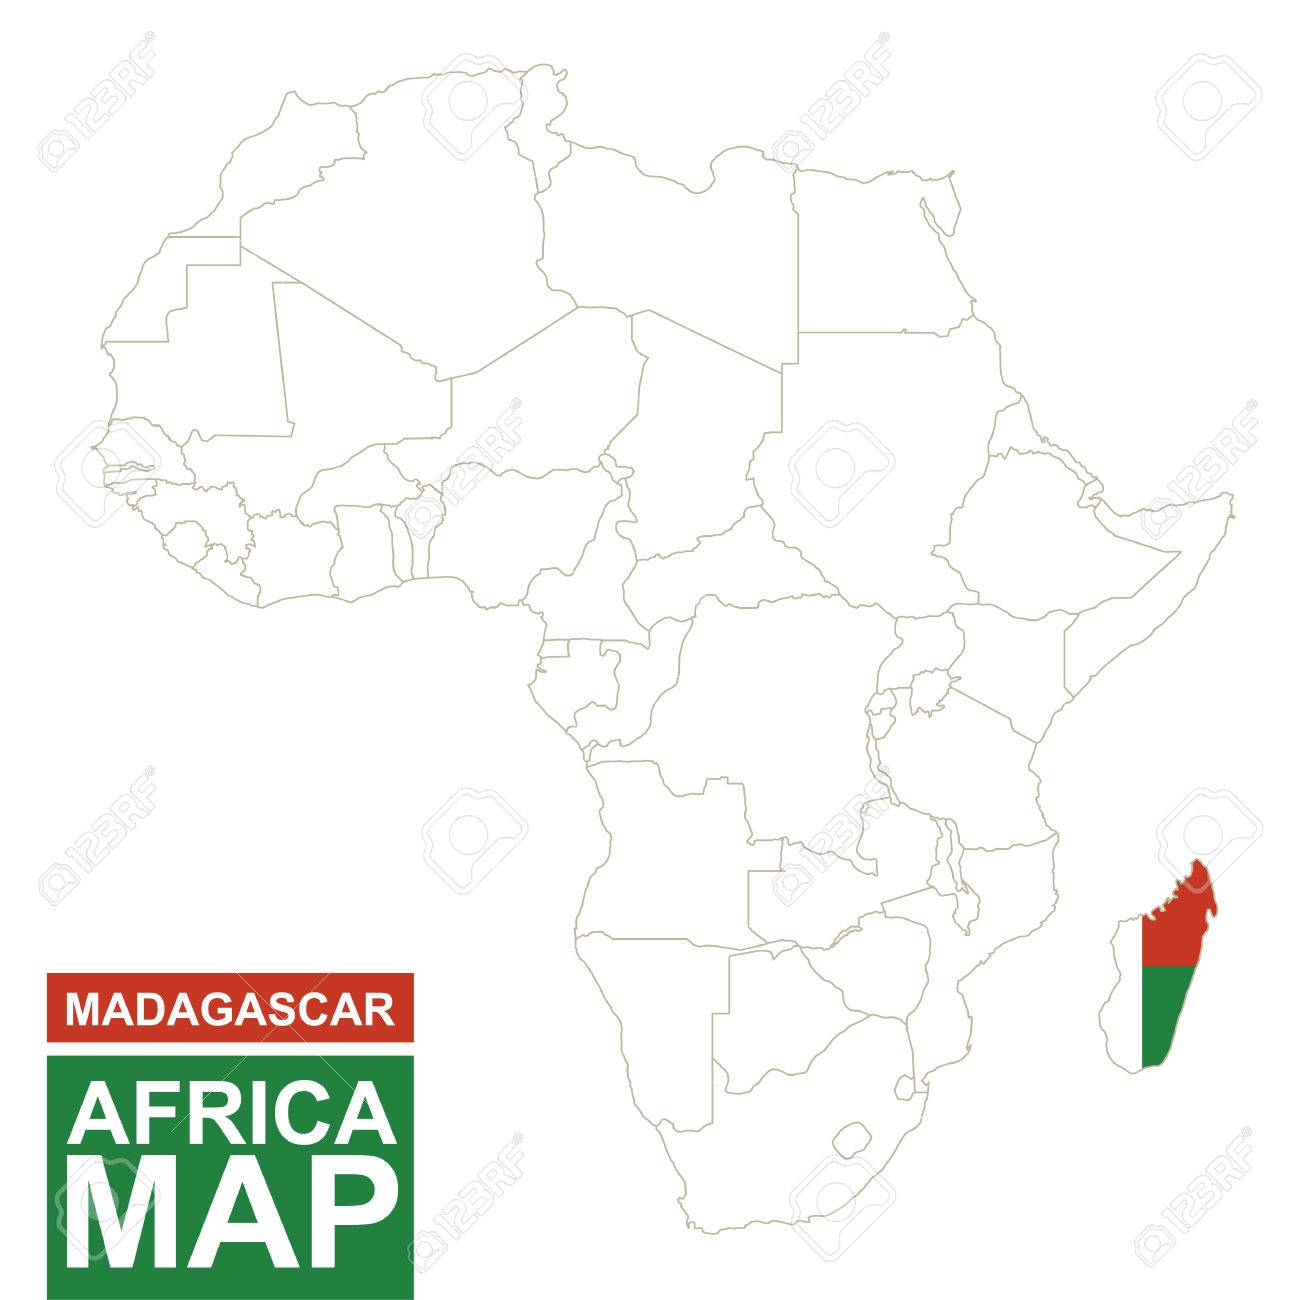 Africa Contoured Map With Highlighted Madagascar Madagascar